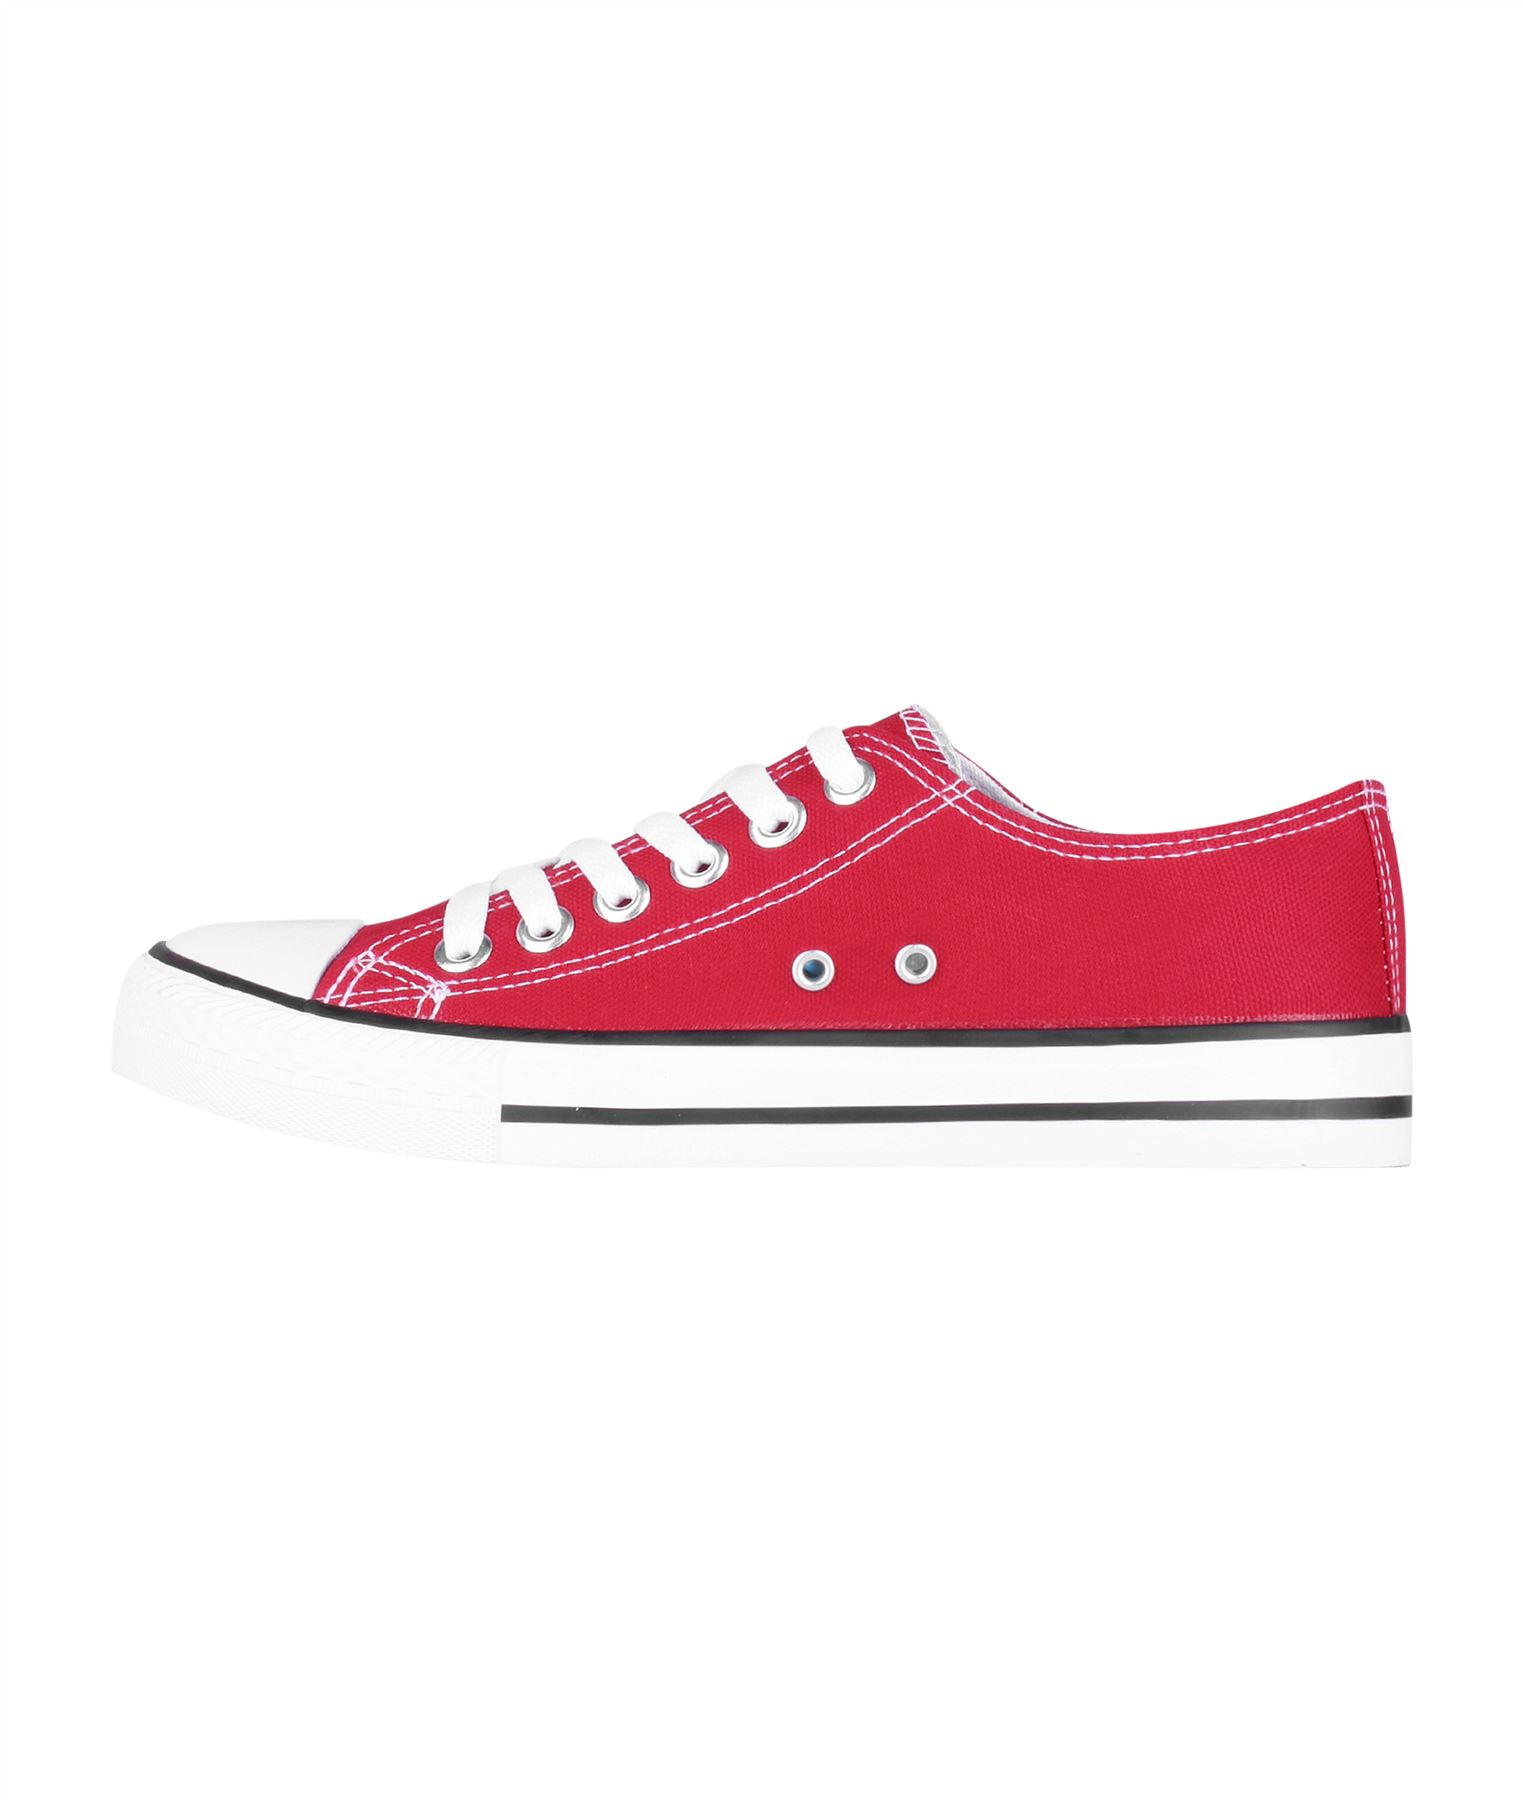 Zapatillas-Mujer-Casuales-Deportiva-Barata-Lona-Moda-Originales-Outlet-Tela-Moda miniatura 40